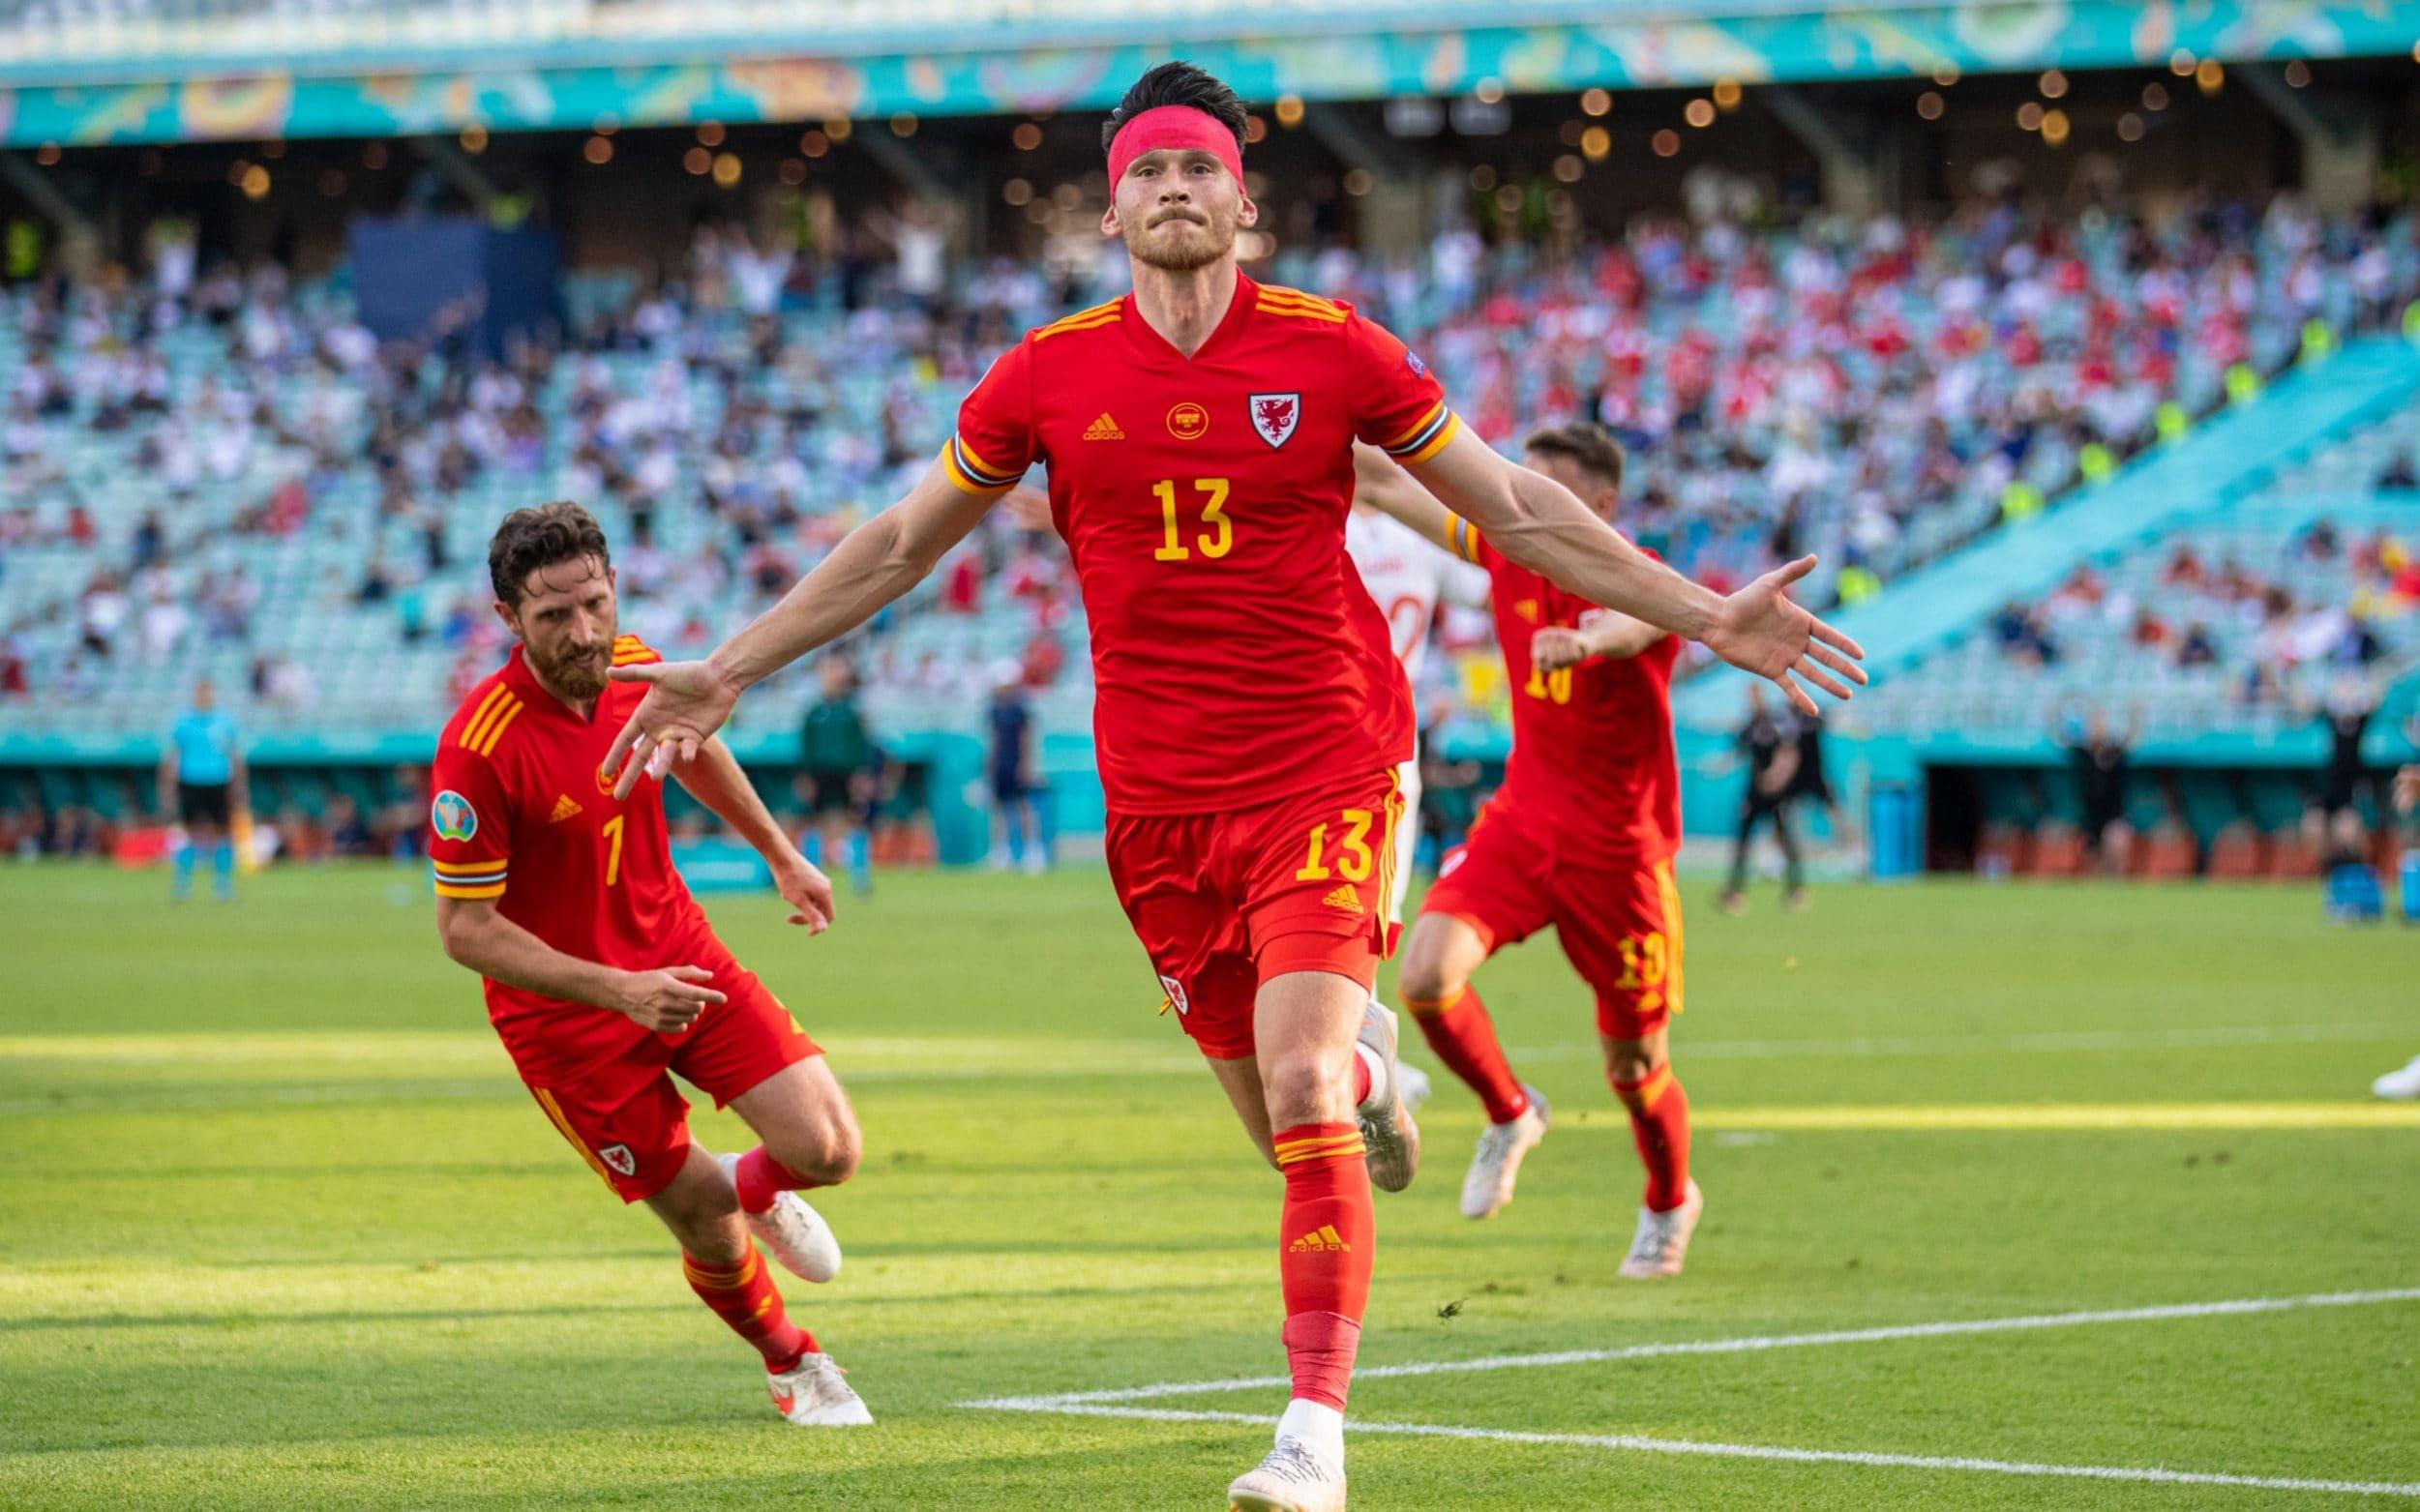 Euro 2020: Wales Draw 1-1 Against Switzerland